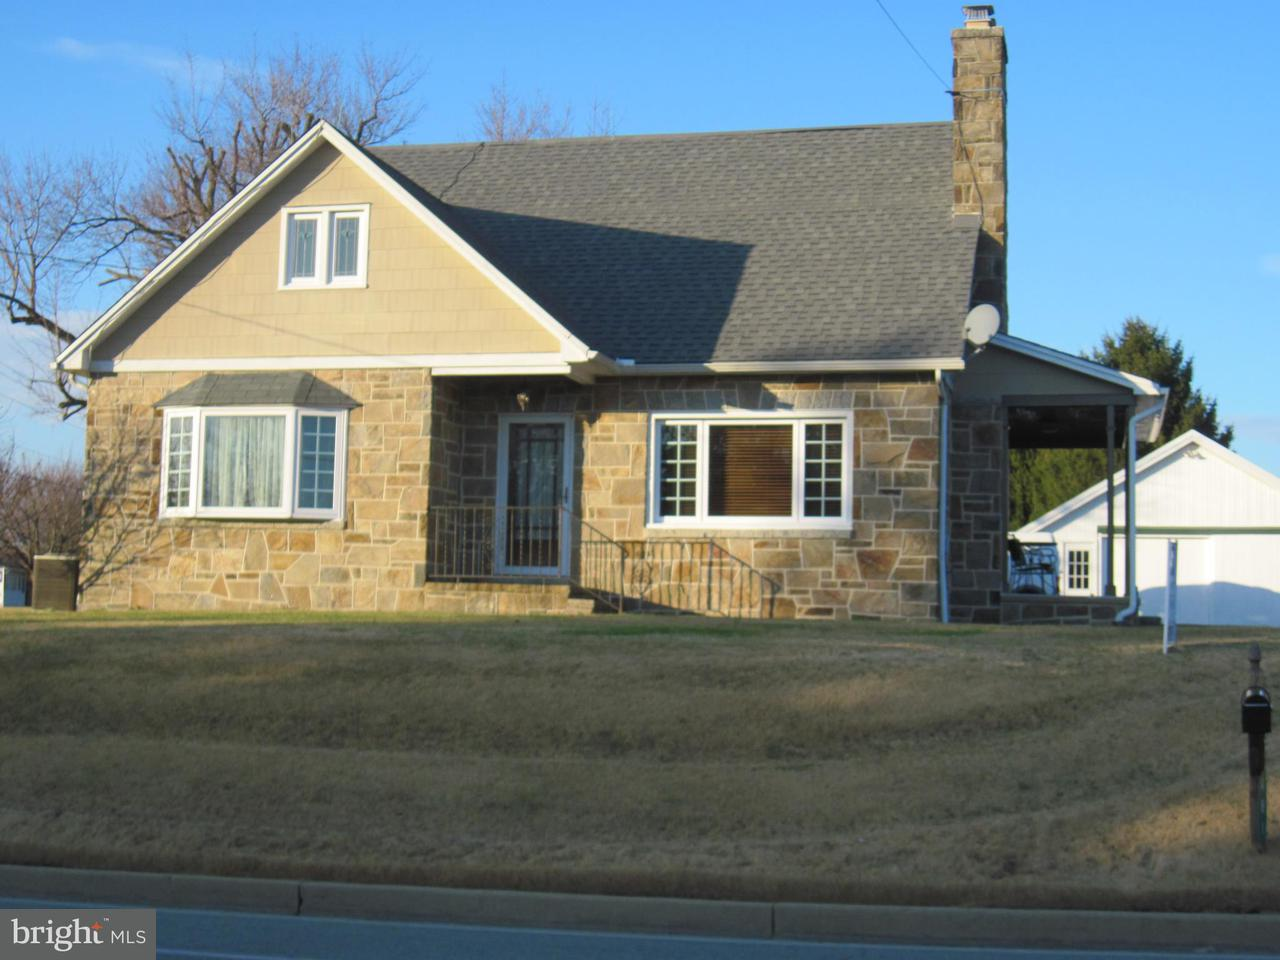 Single Family for Sale at 481 Joseph Biggs Memorial Hwy Rising Sun, Maryland 21911 United States